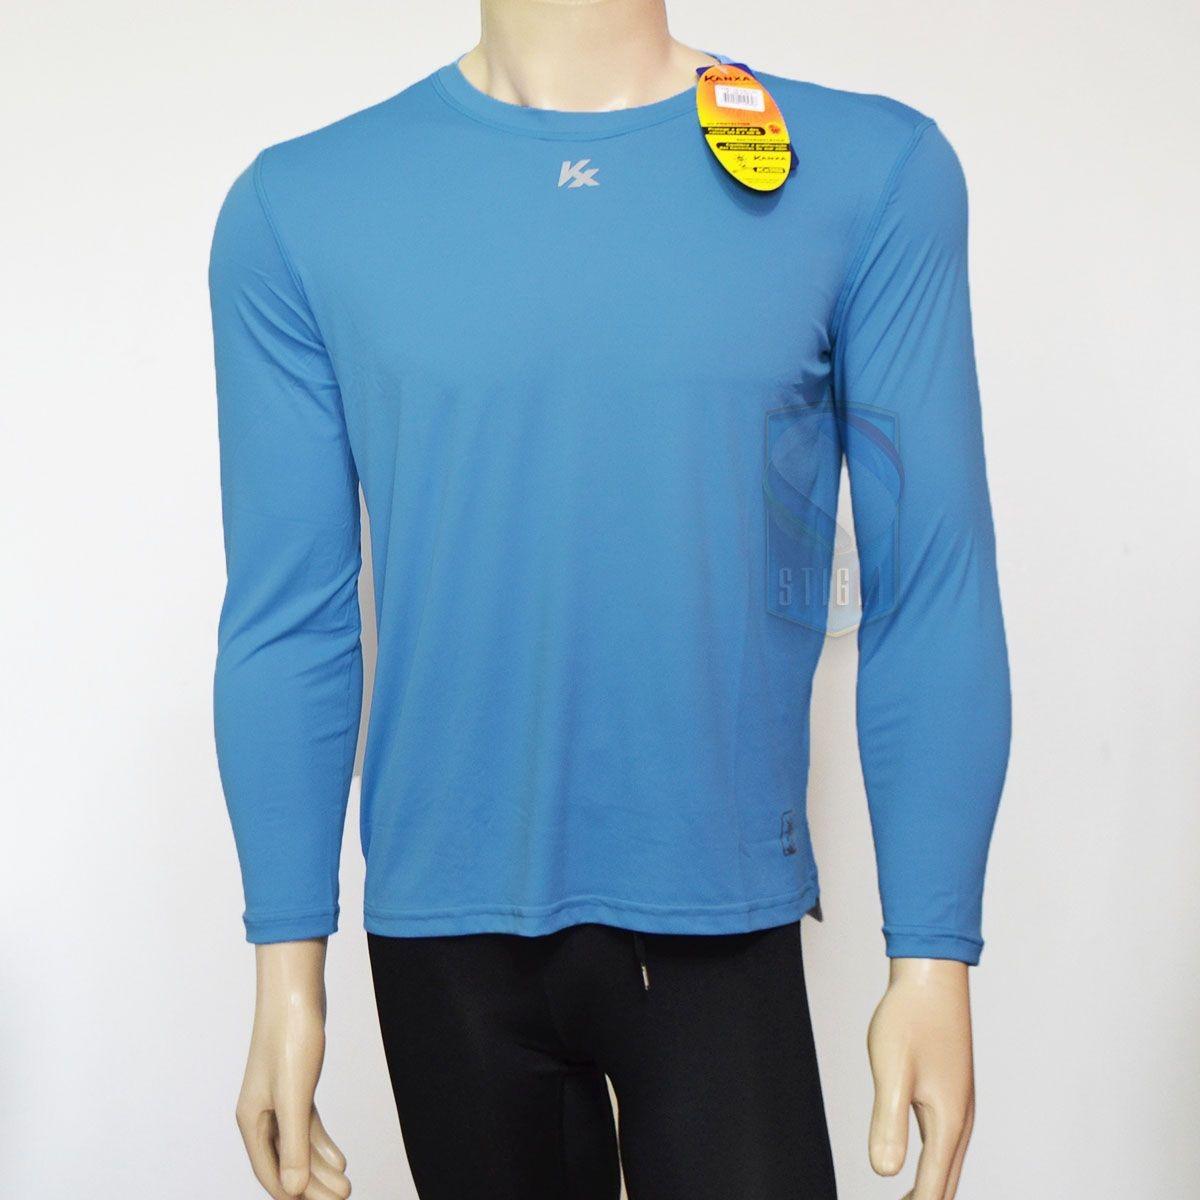 Camisa Manga Longa Kanxa Proteção Solar Fps 50+ Bactericida - R  89 ... 5c9c626f33666